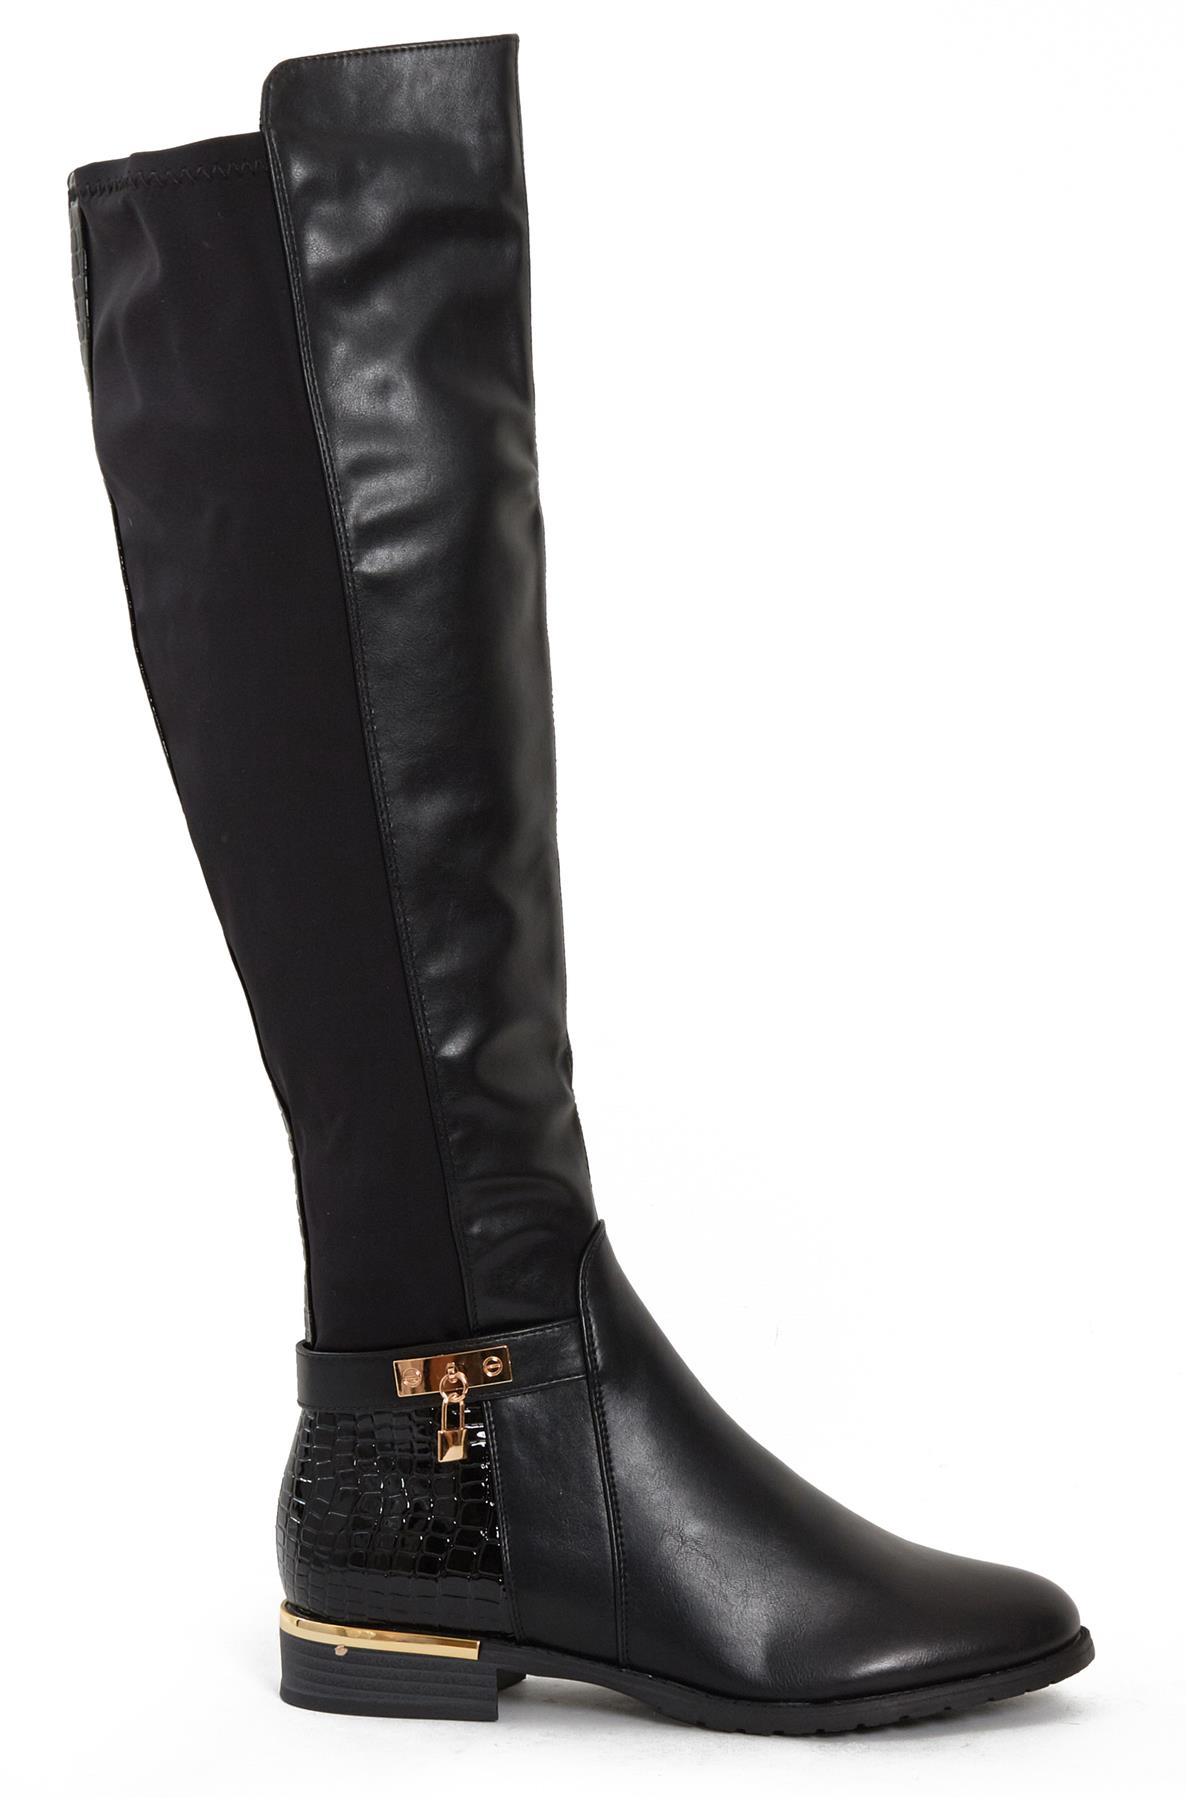 Womens-Ladies-Knee-High-Gold-Detail-Low-Block-Heel-Zip-Up-PU-Suede-Black-Boots thumbnail 3